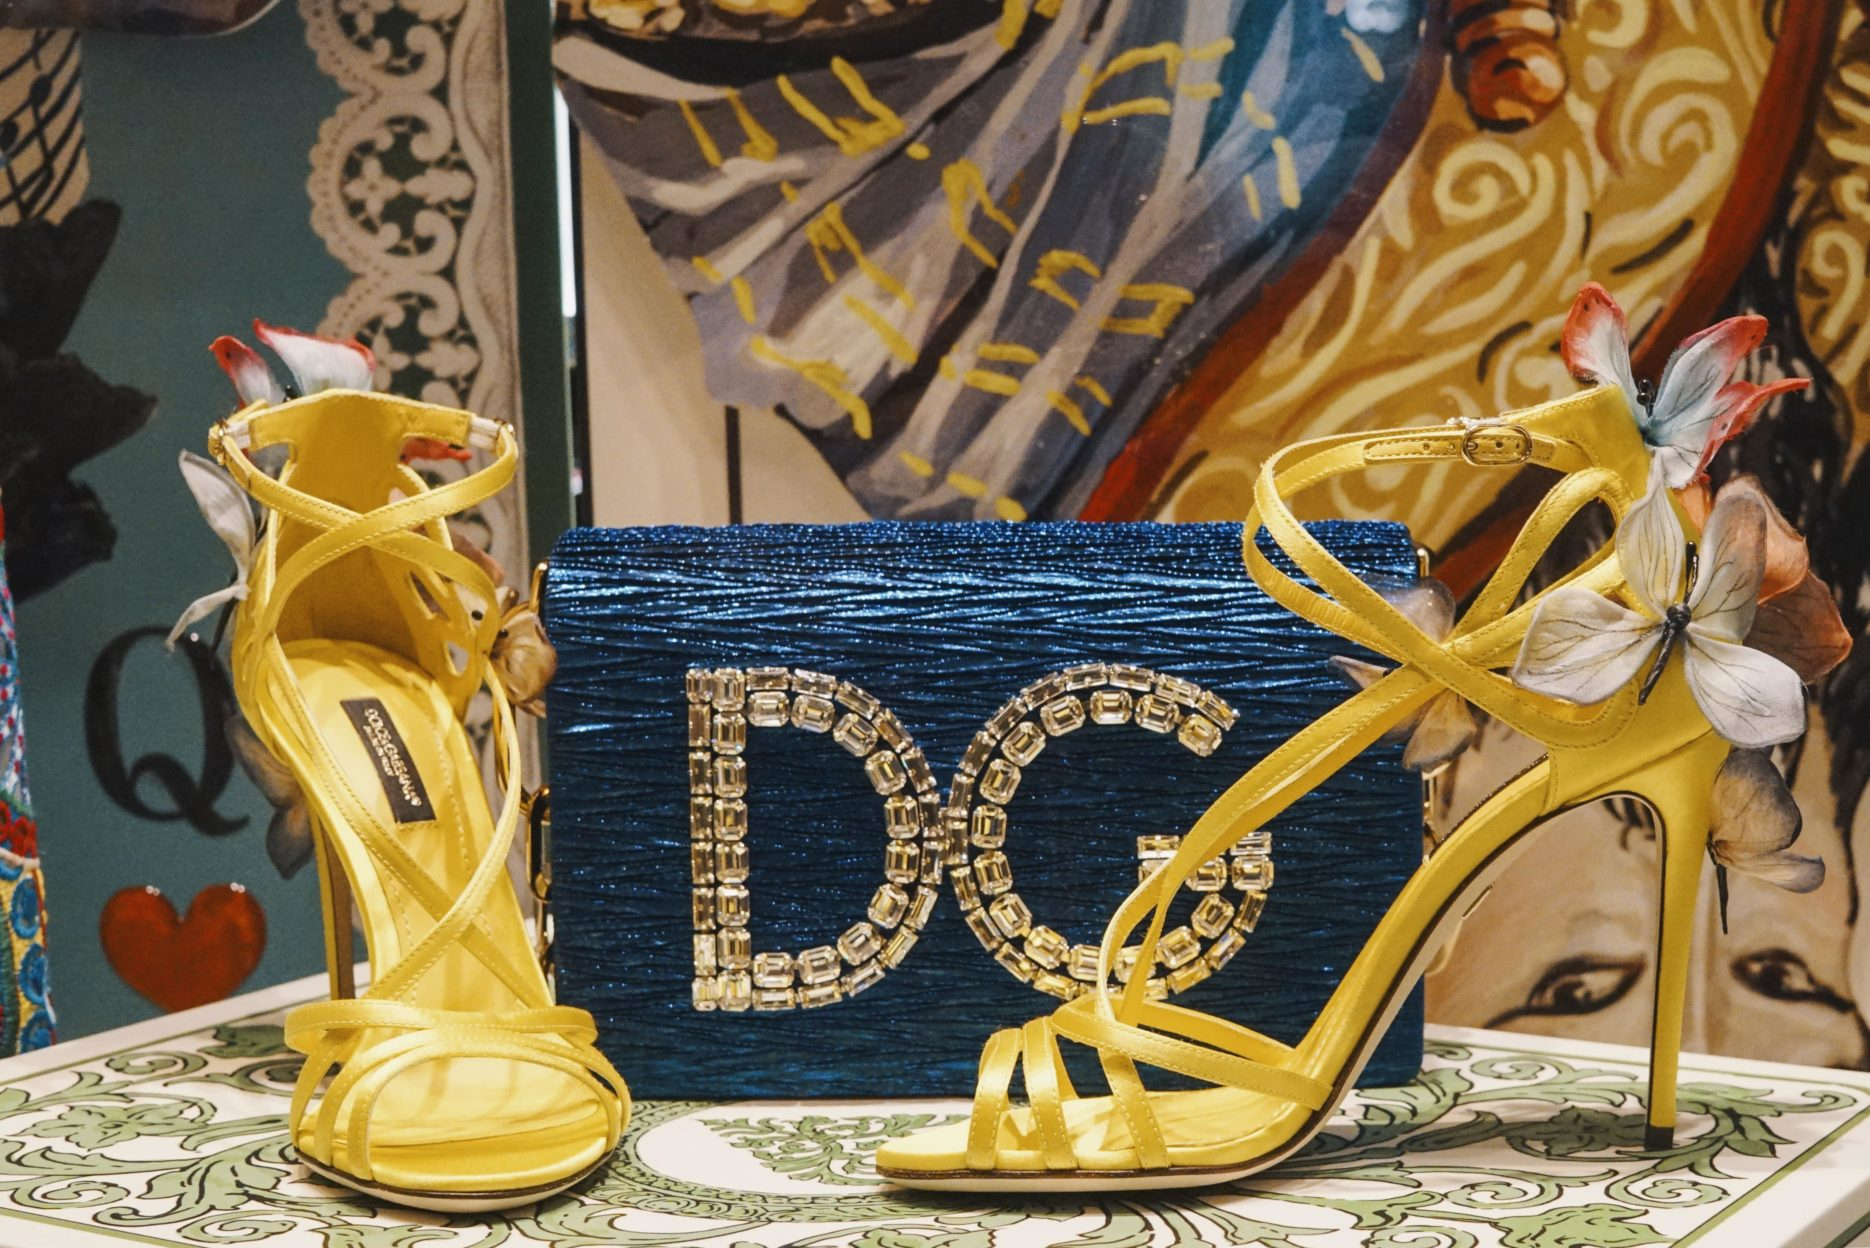 Dolce & Gabbana. Credit: Adobe Stock